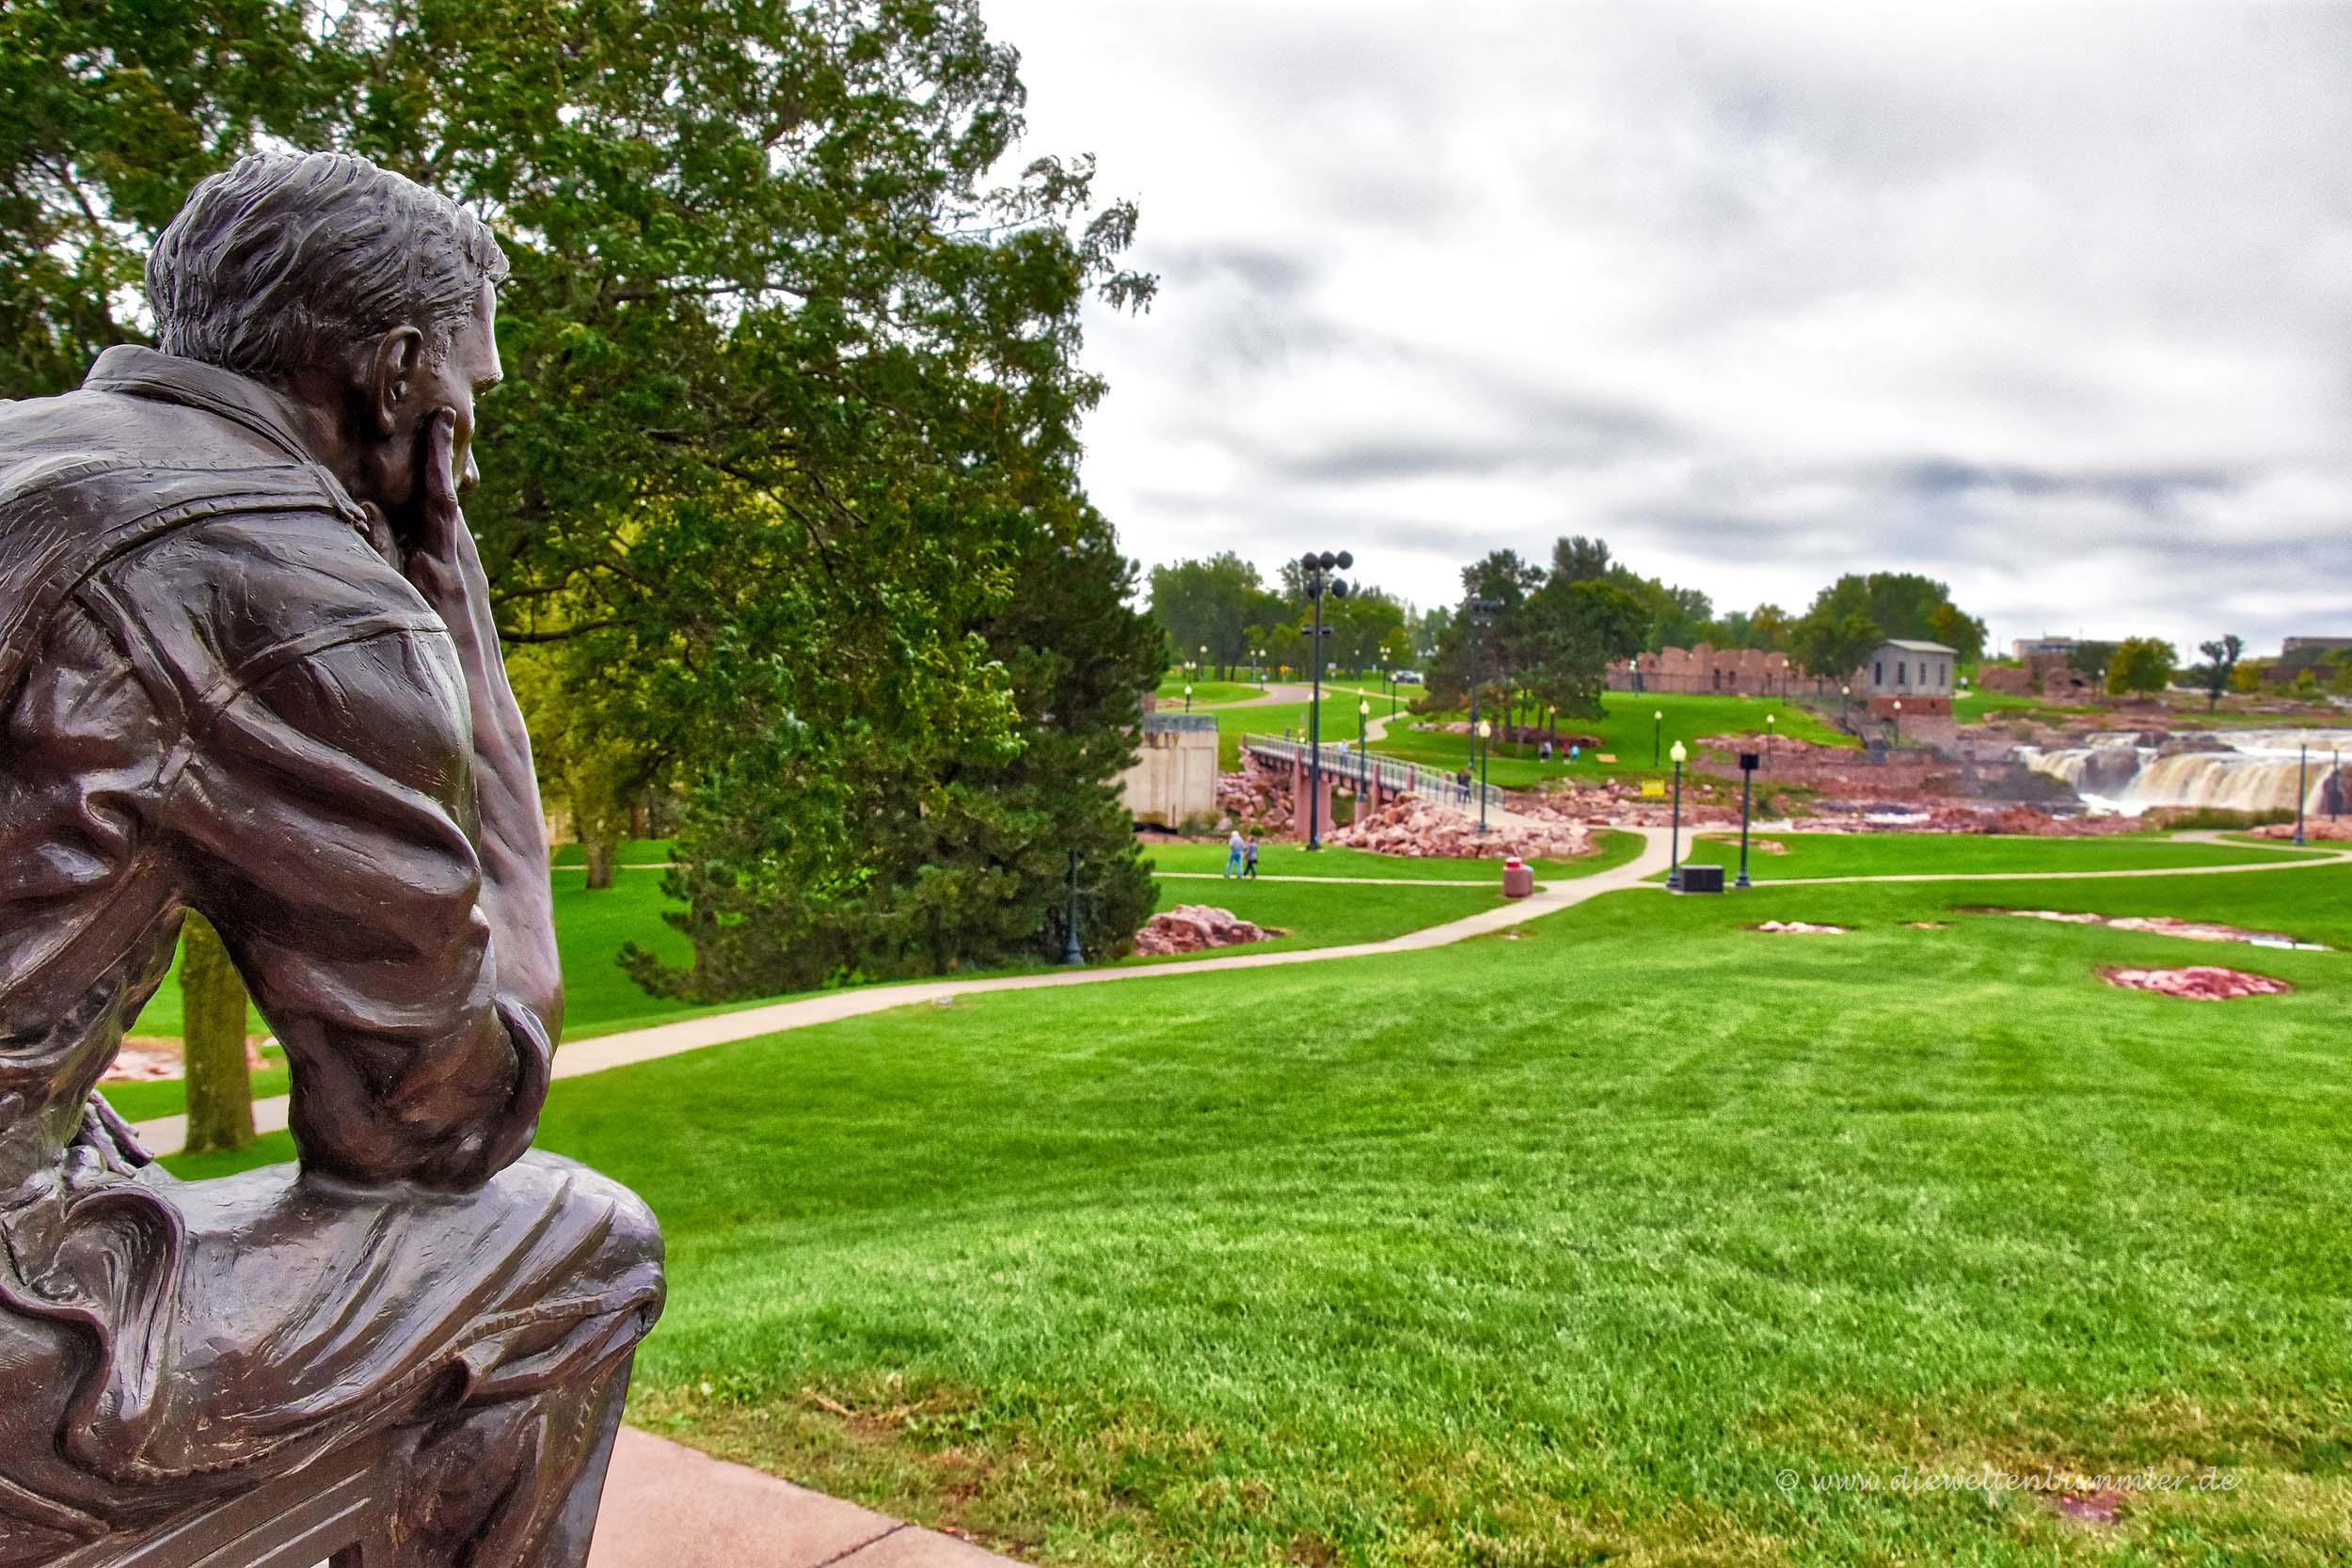 Skulptur am Rande des Parks